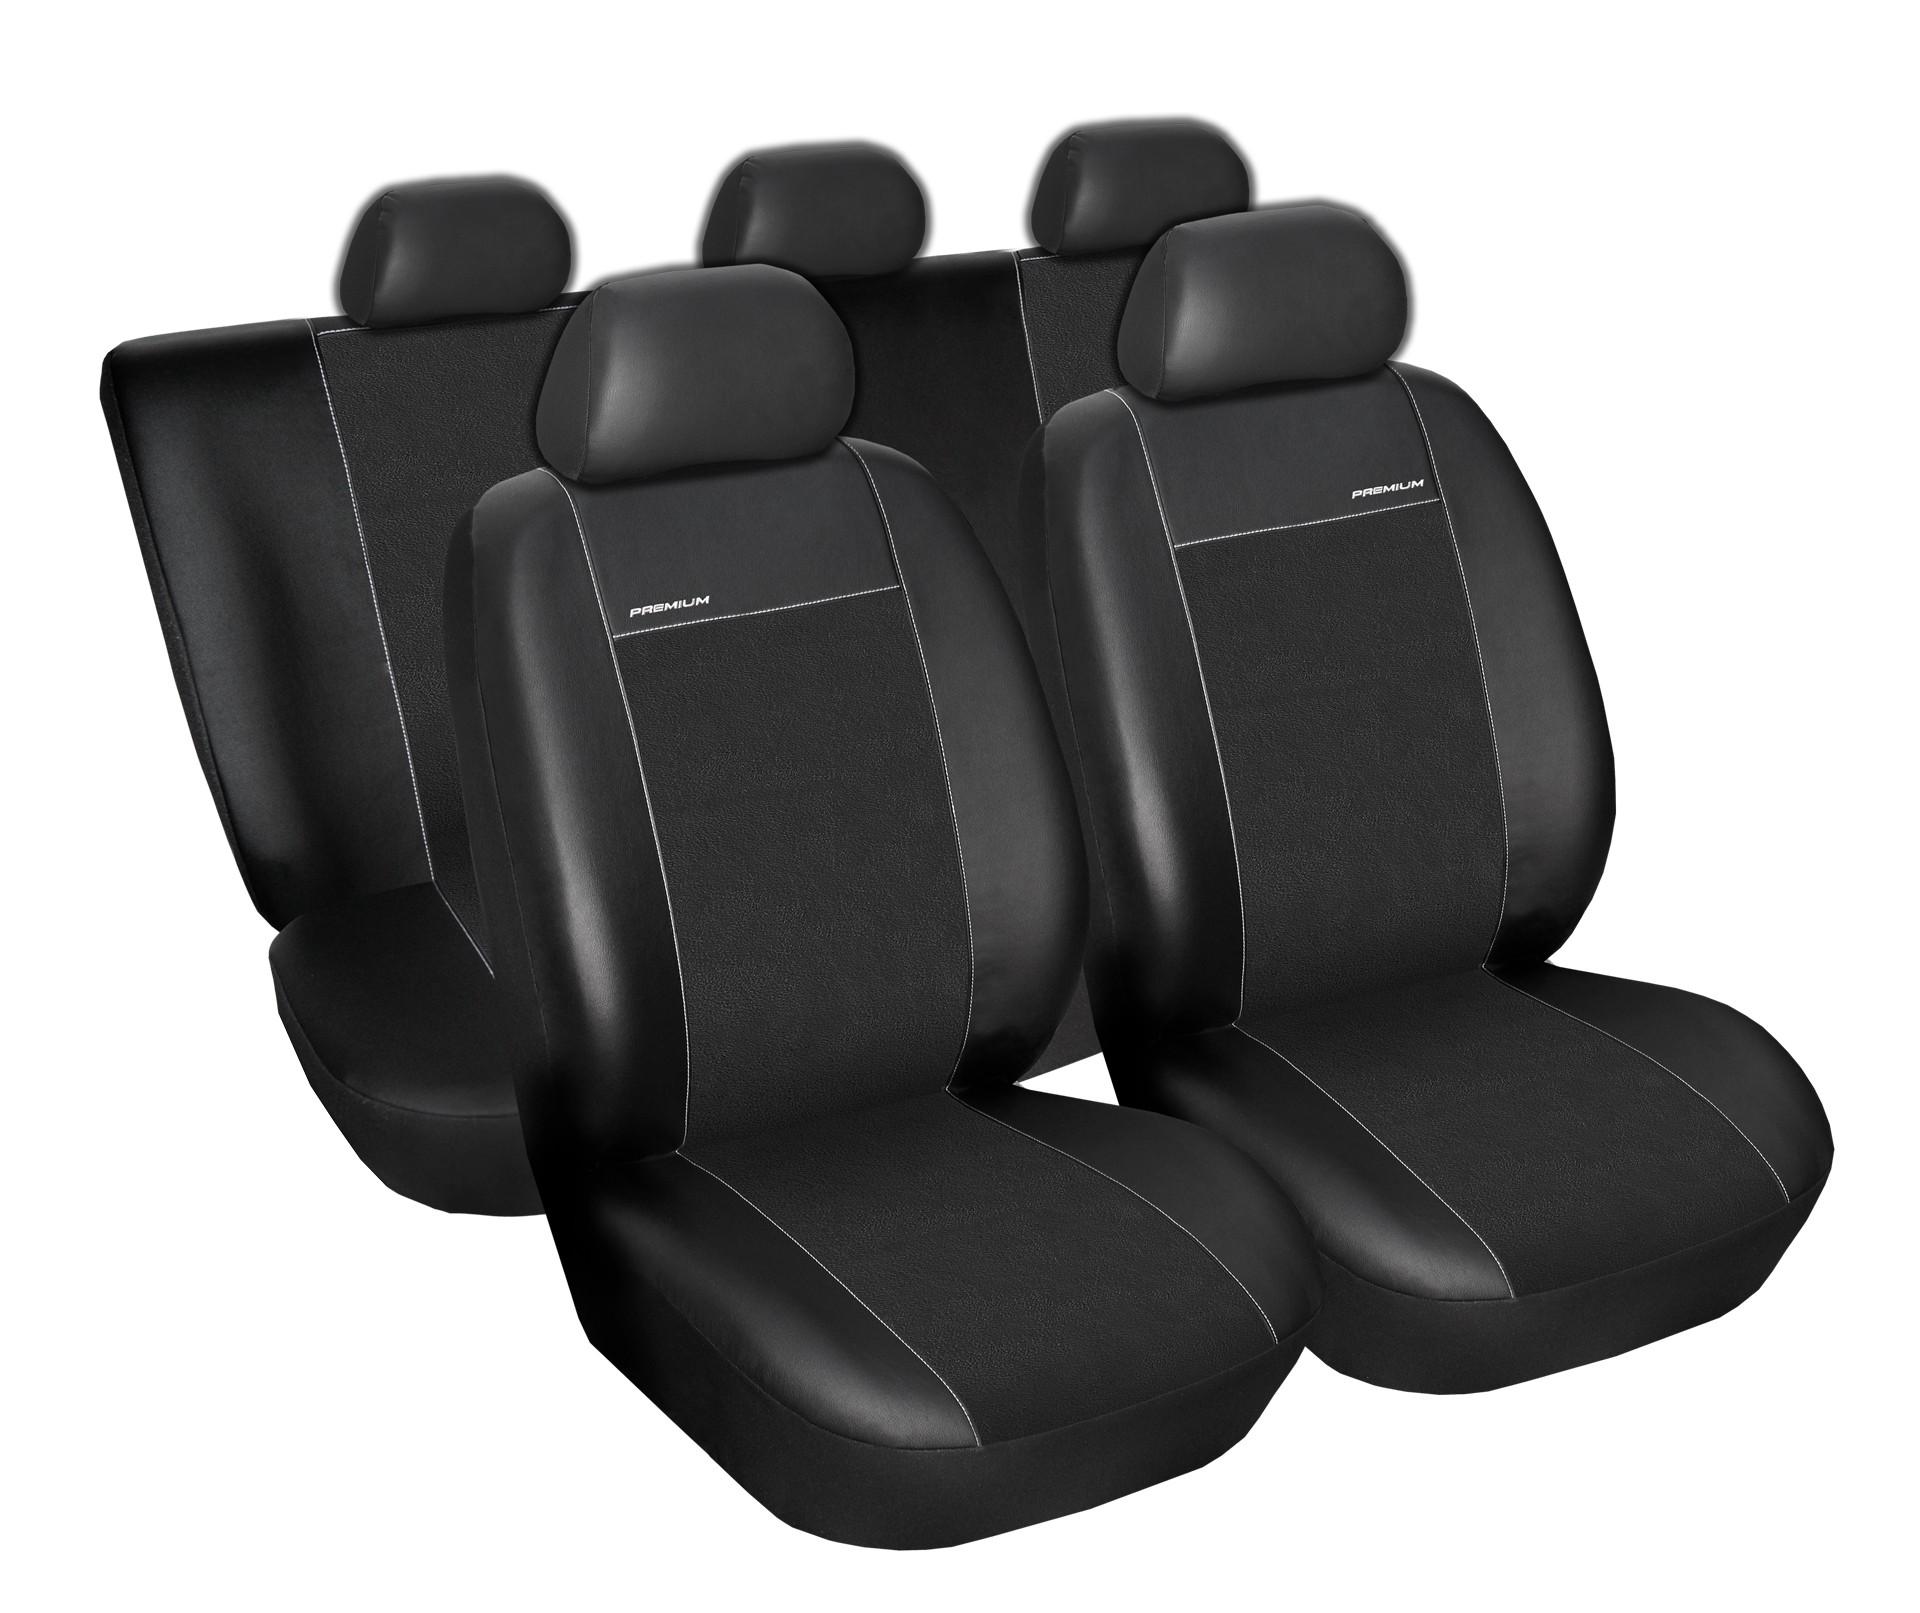 Autopotahy Citroen C4 II, 5 dveř, od r. 2011, Eco kůže + alcantara černé